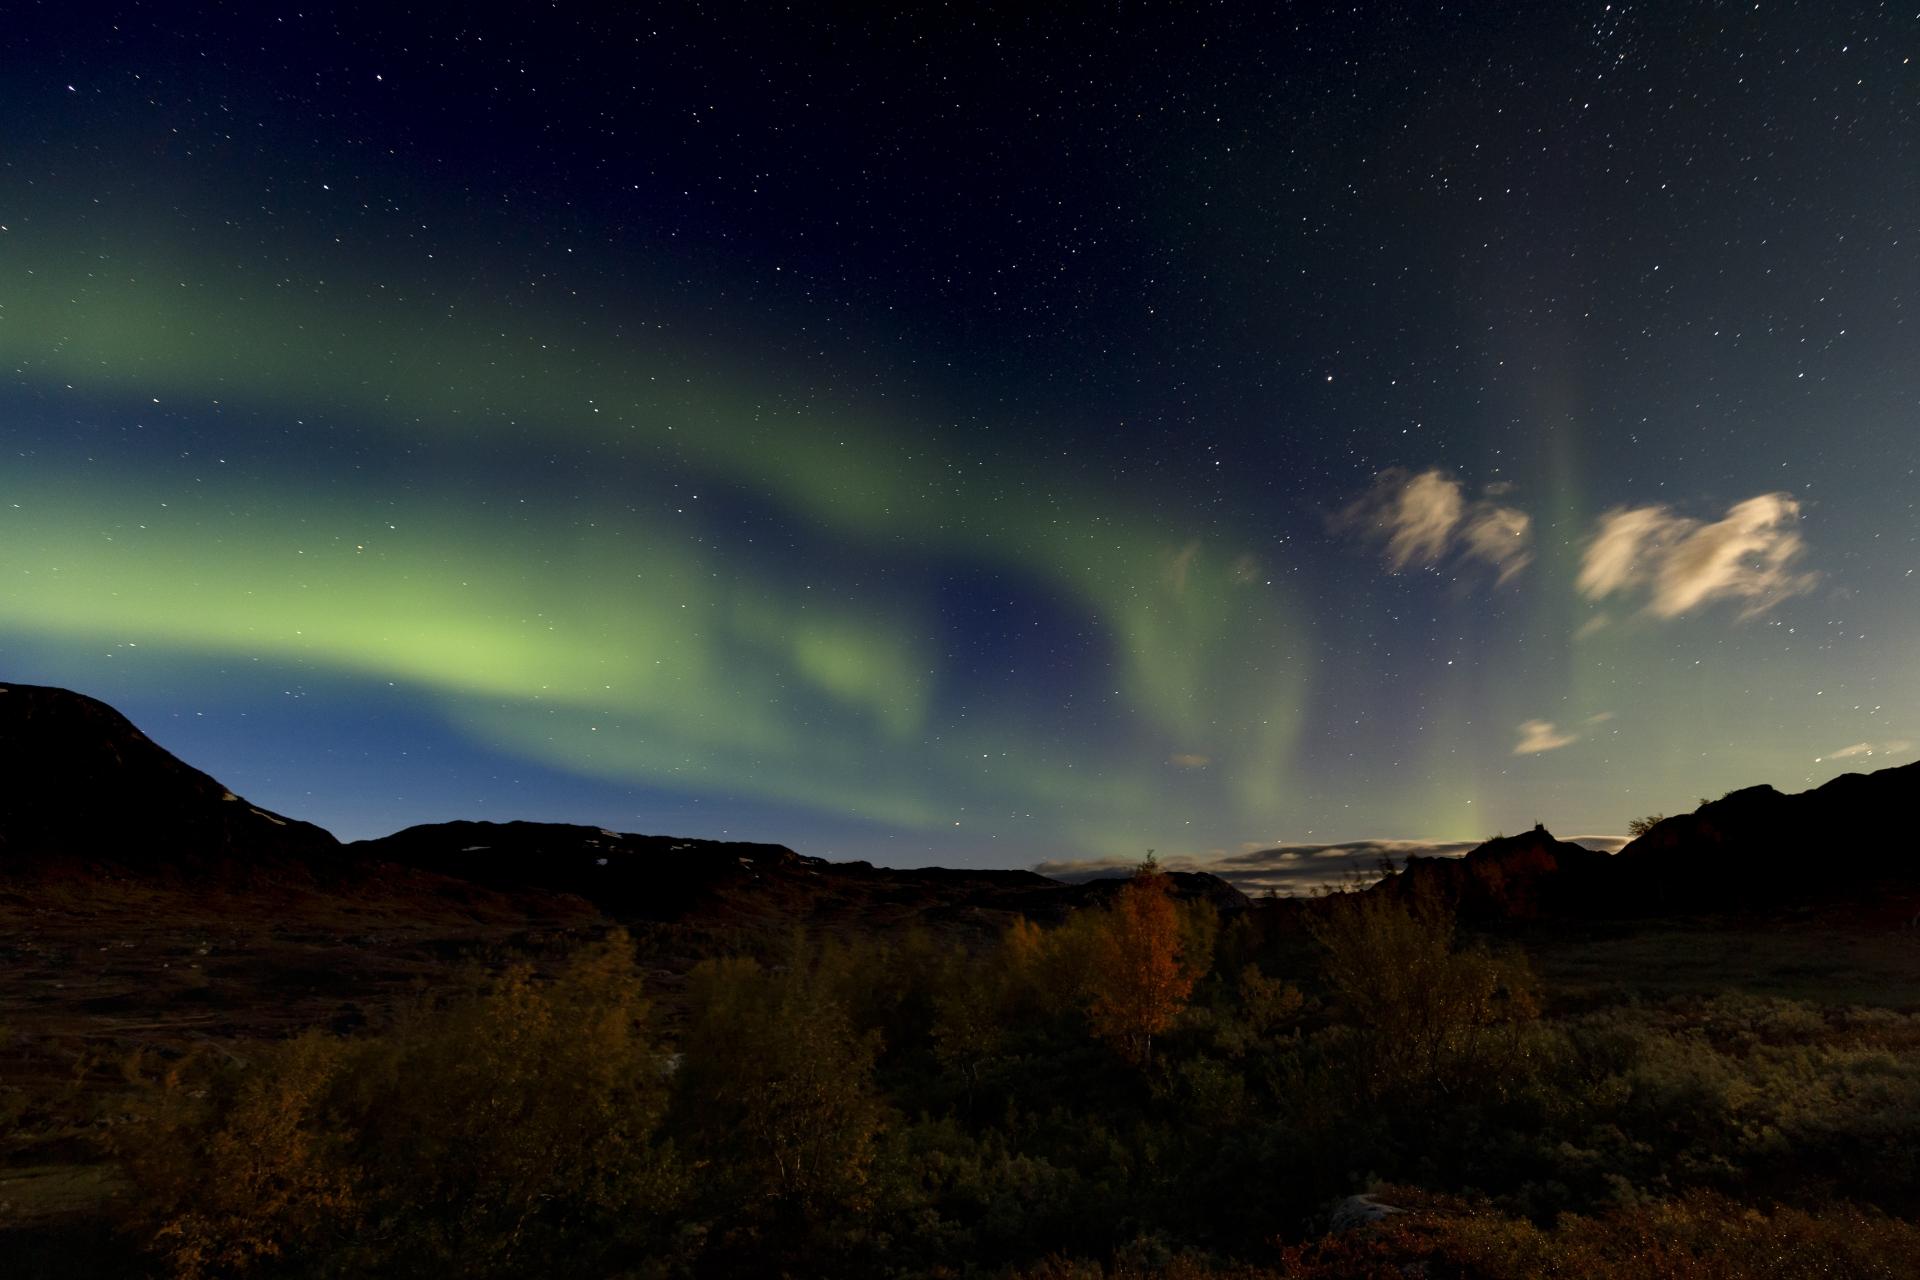 Aurora borealis in Unna Allakas